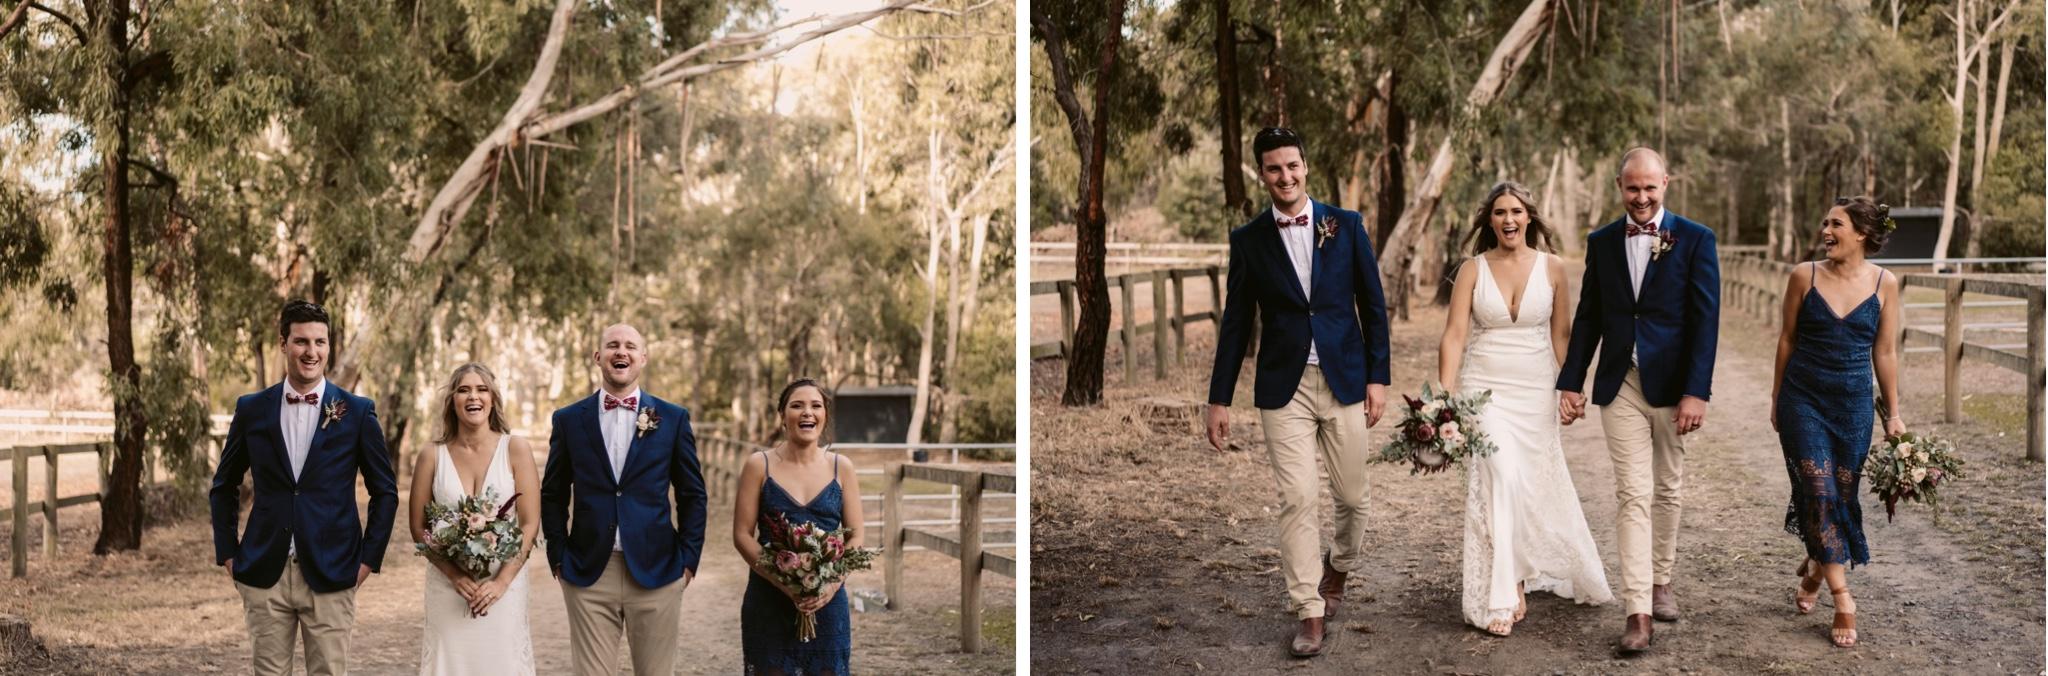 Mornington Peninsula Wedding Photography63.jpg